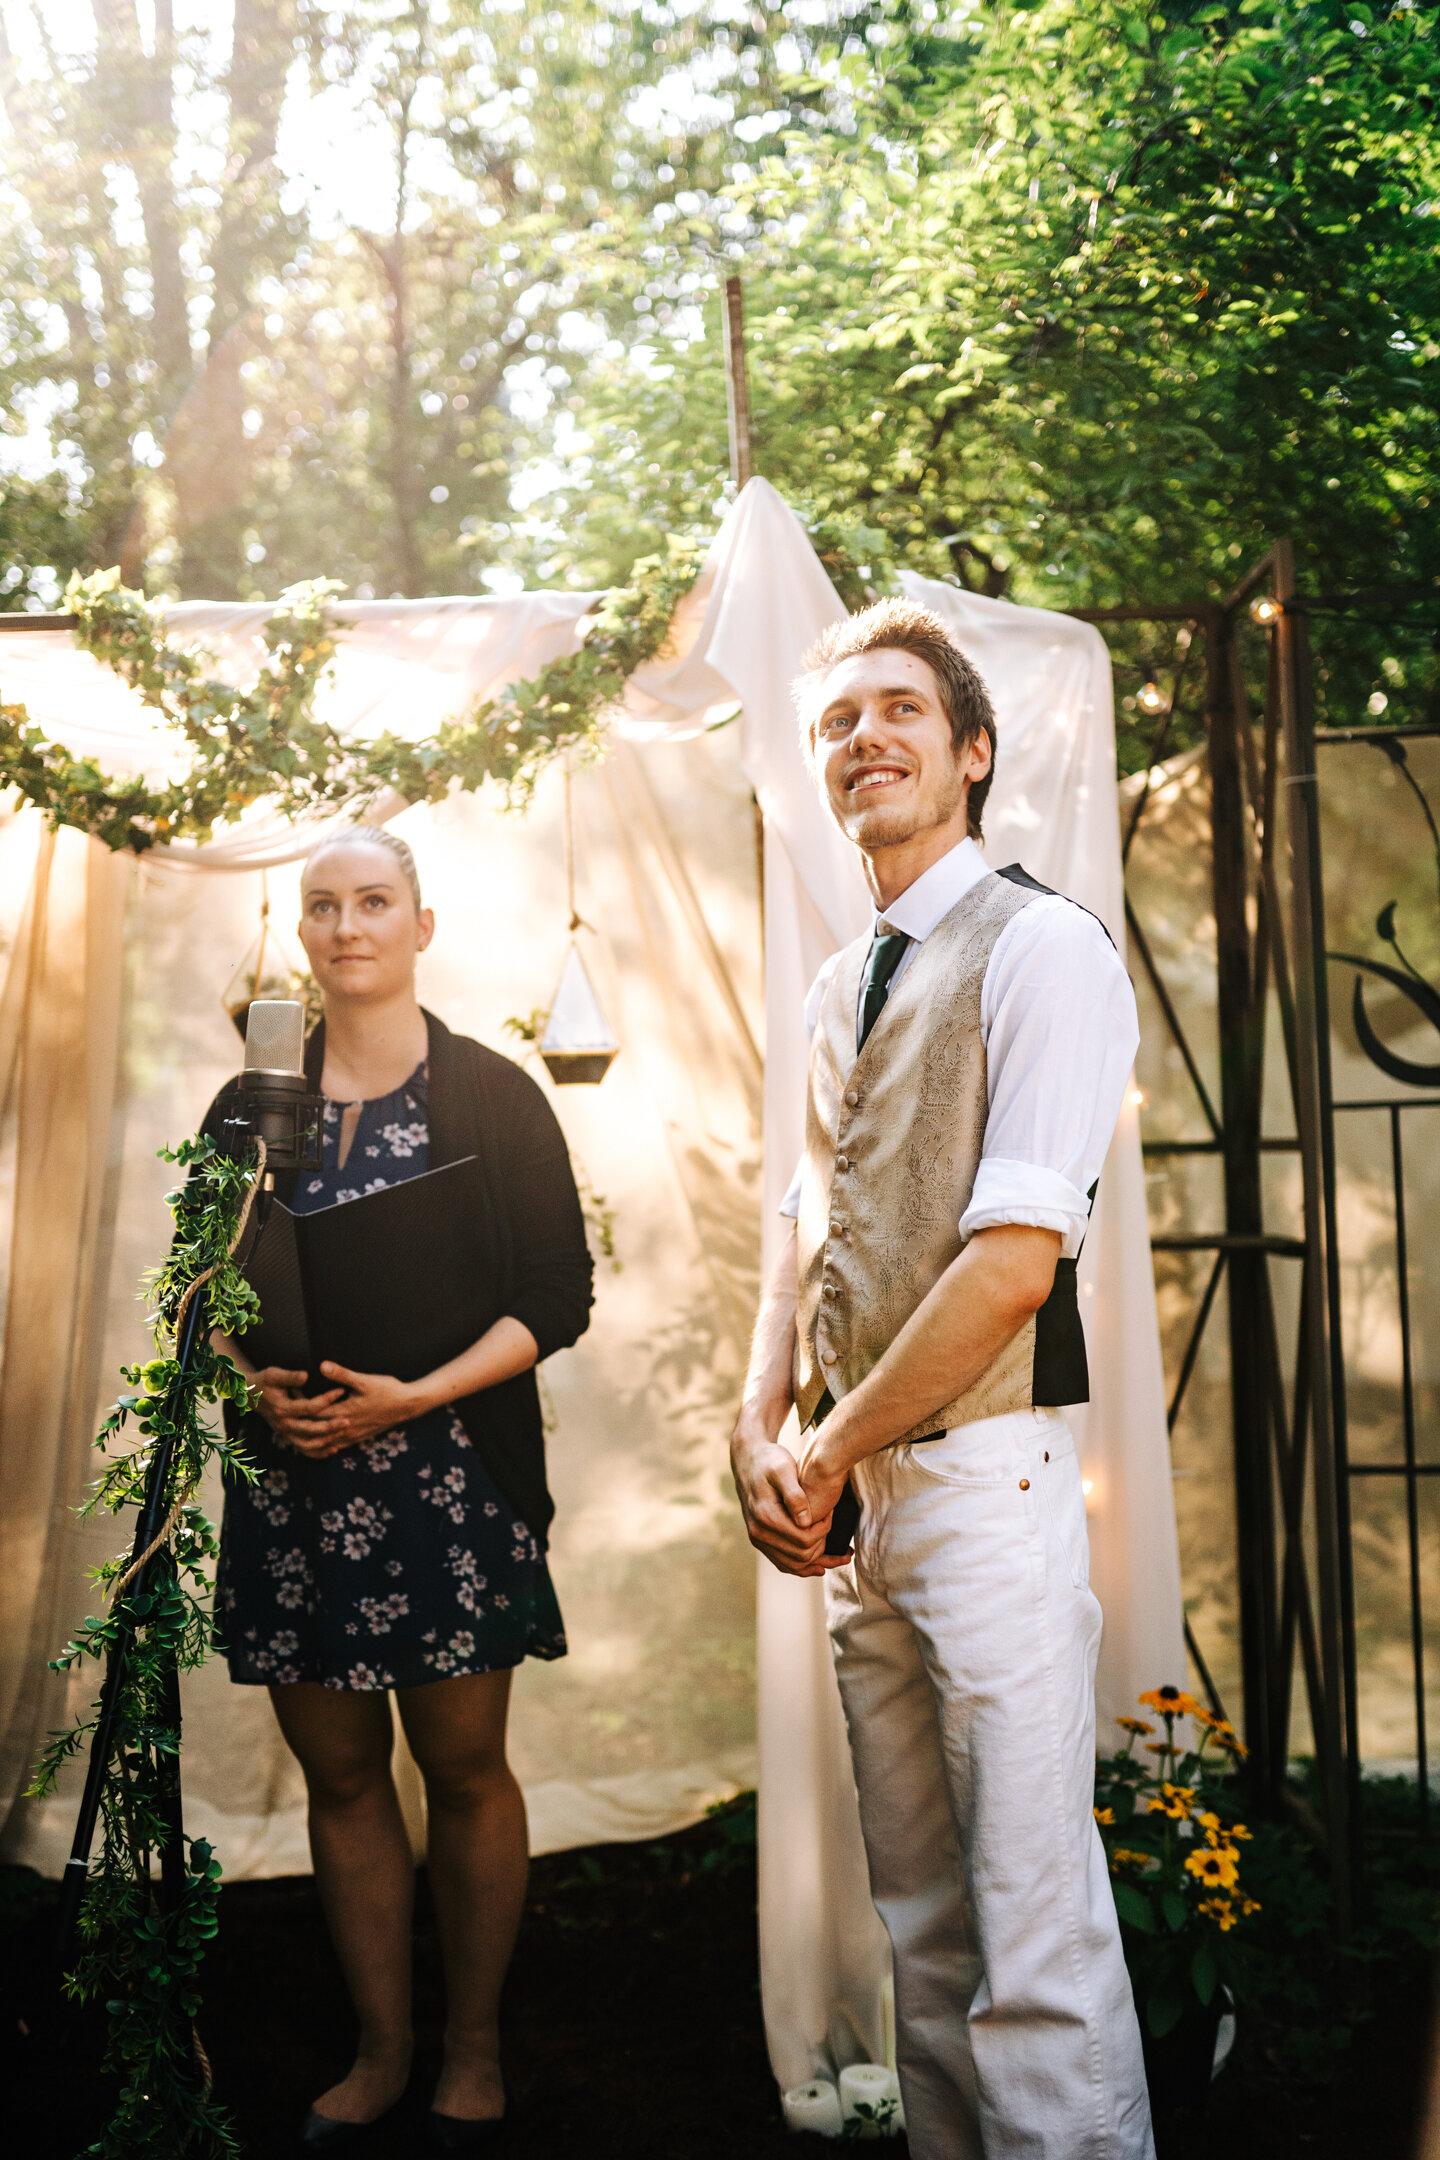 Jake-Amber-Wedding-06970.jpg